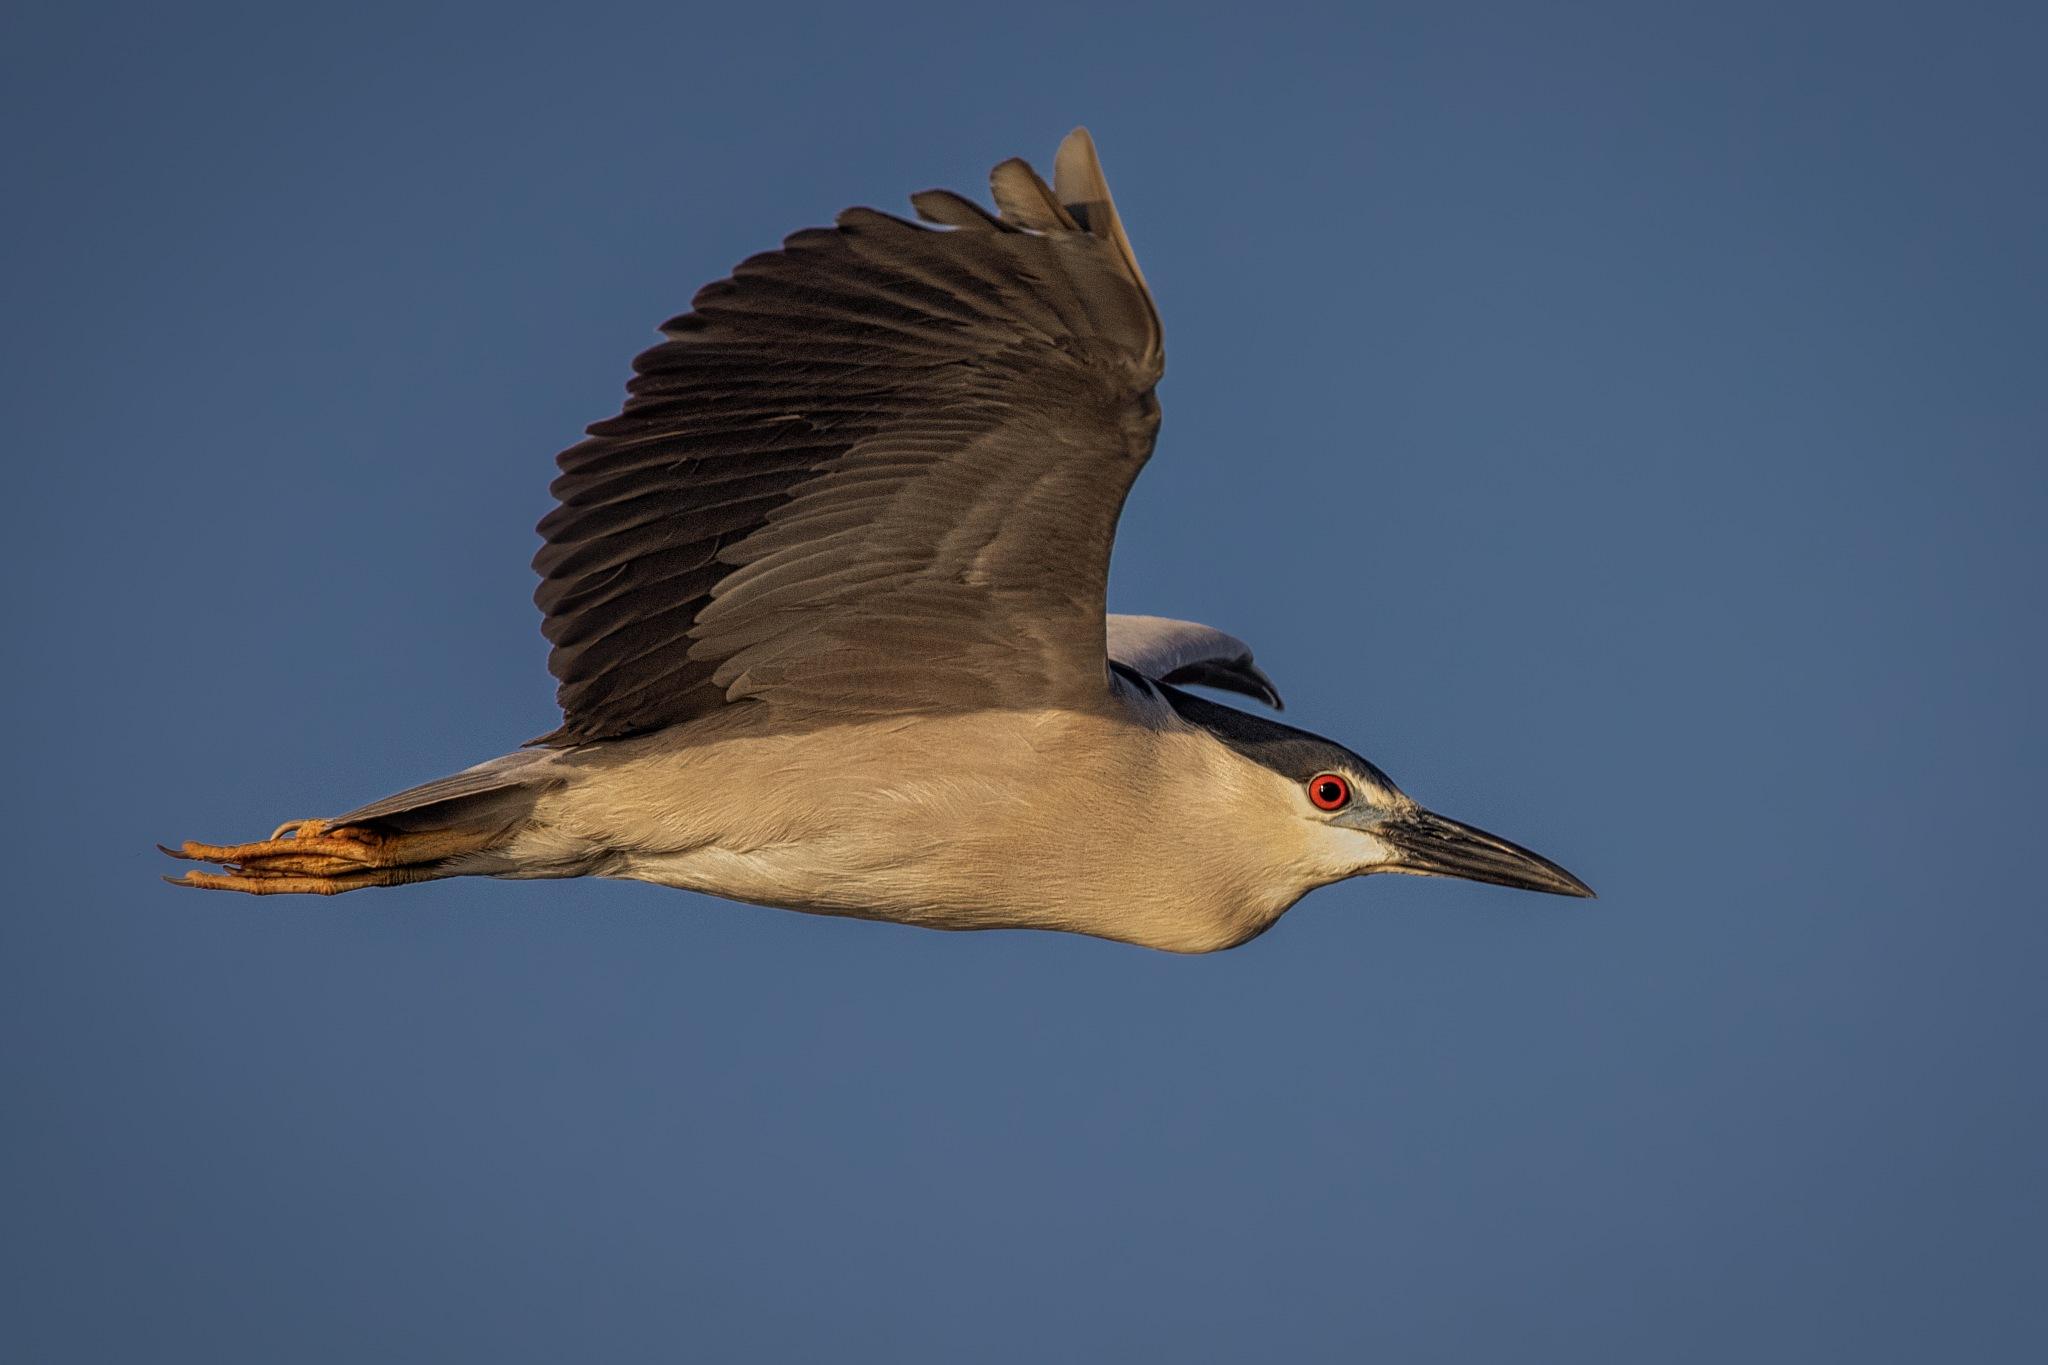 Black-crowned night heron flyby by Boris Droutman